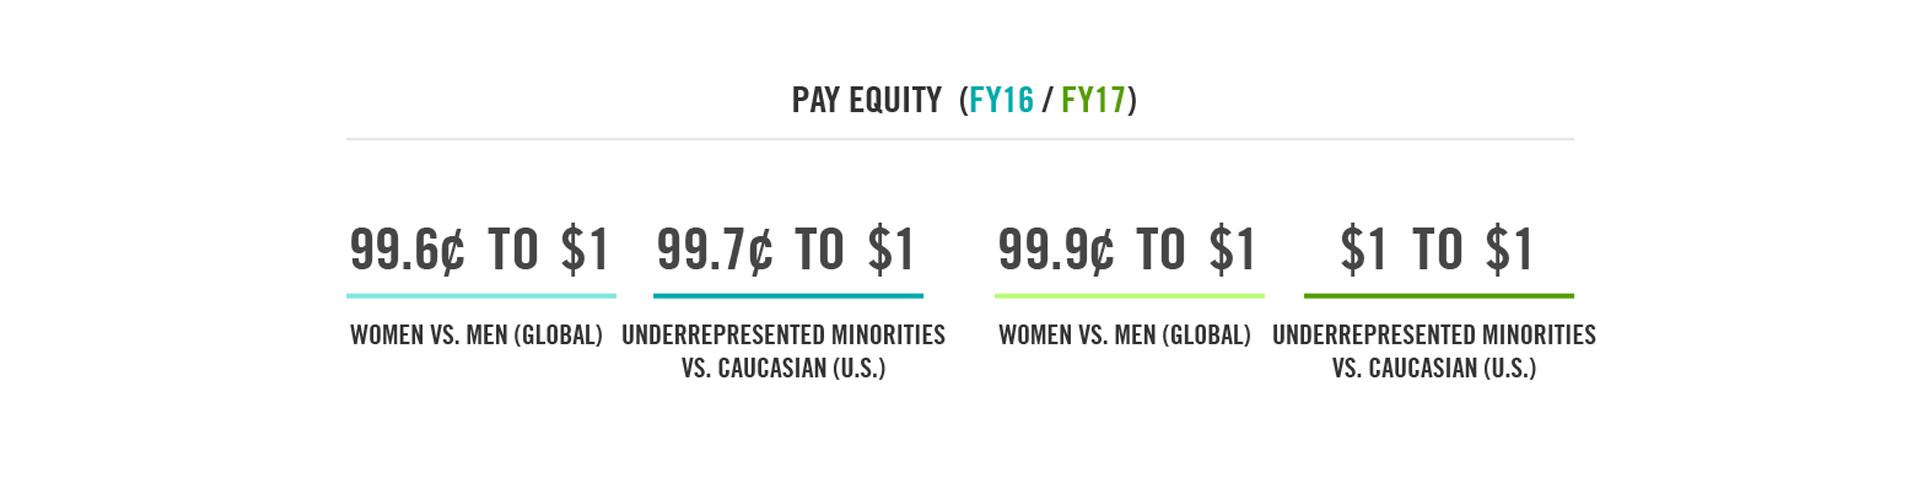 boicotear inteligencia Suri  FY17 Representation and Pay | Nike Purpose